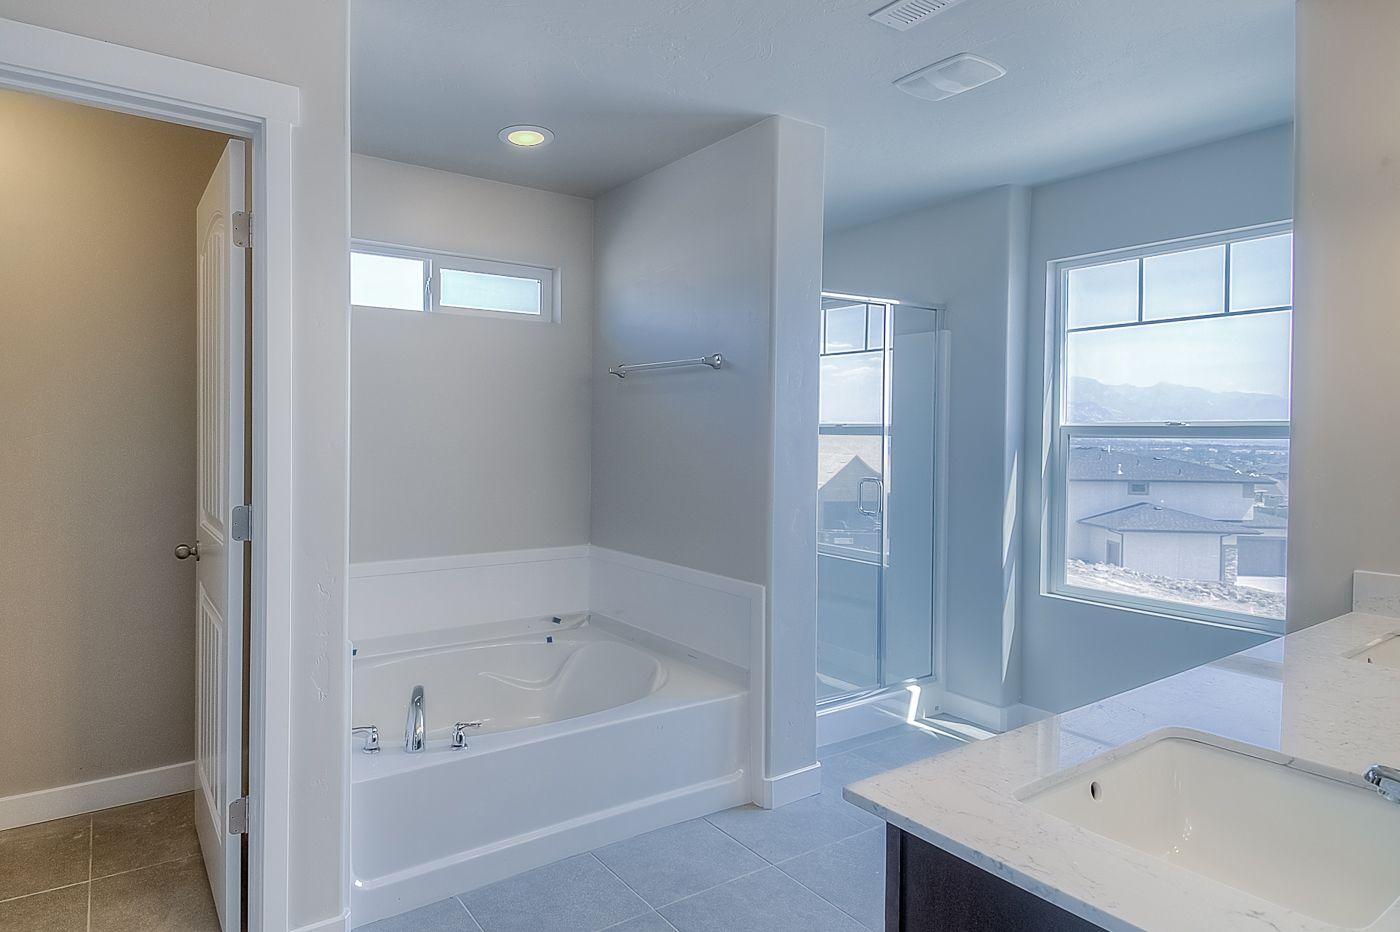 Bathroom featured in the Teton By D.R. Horton in Salt Lake City-Ogden, UT